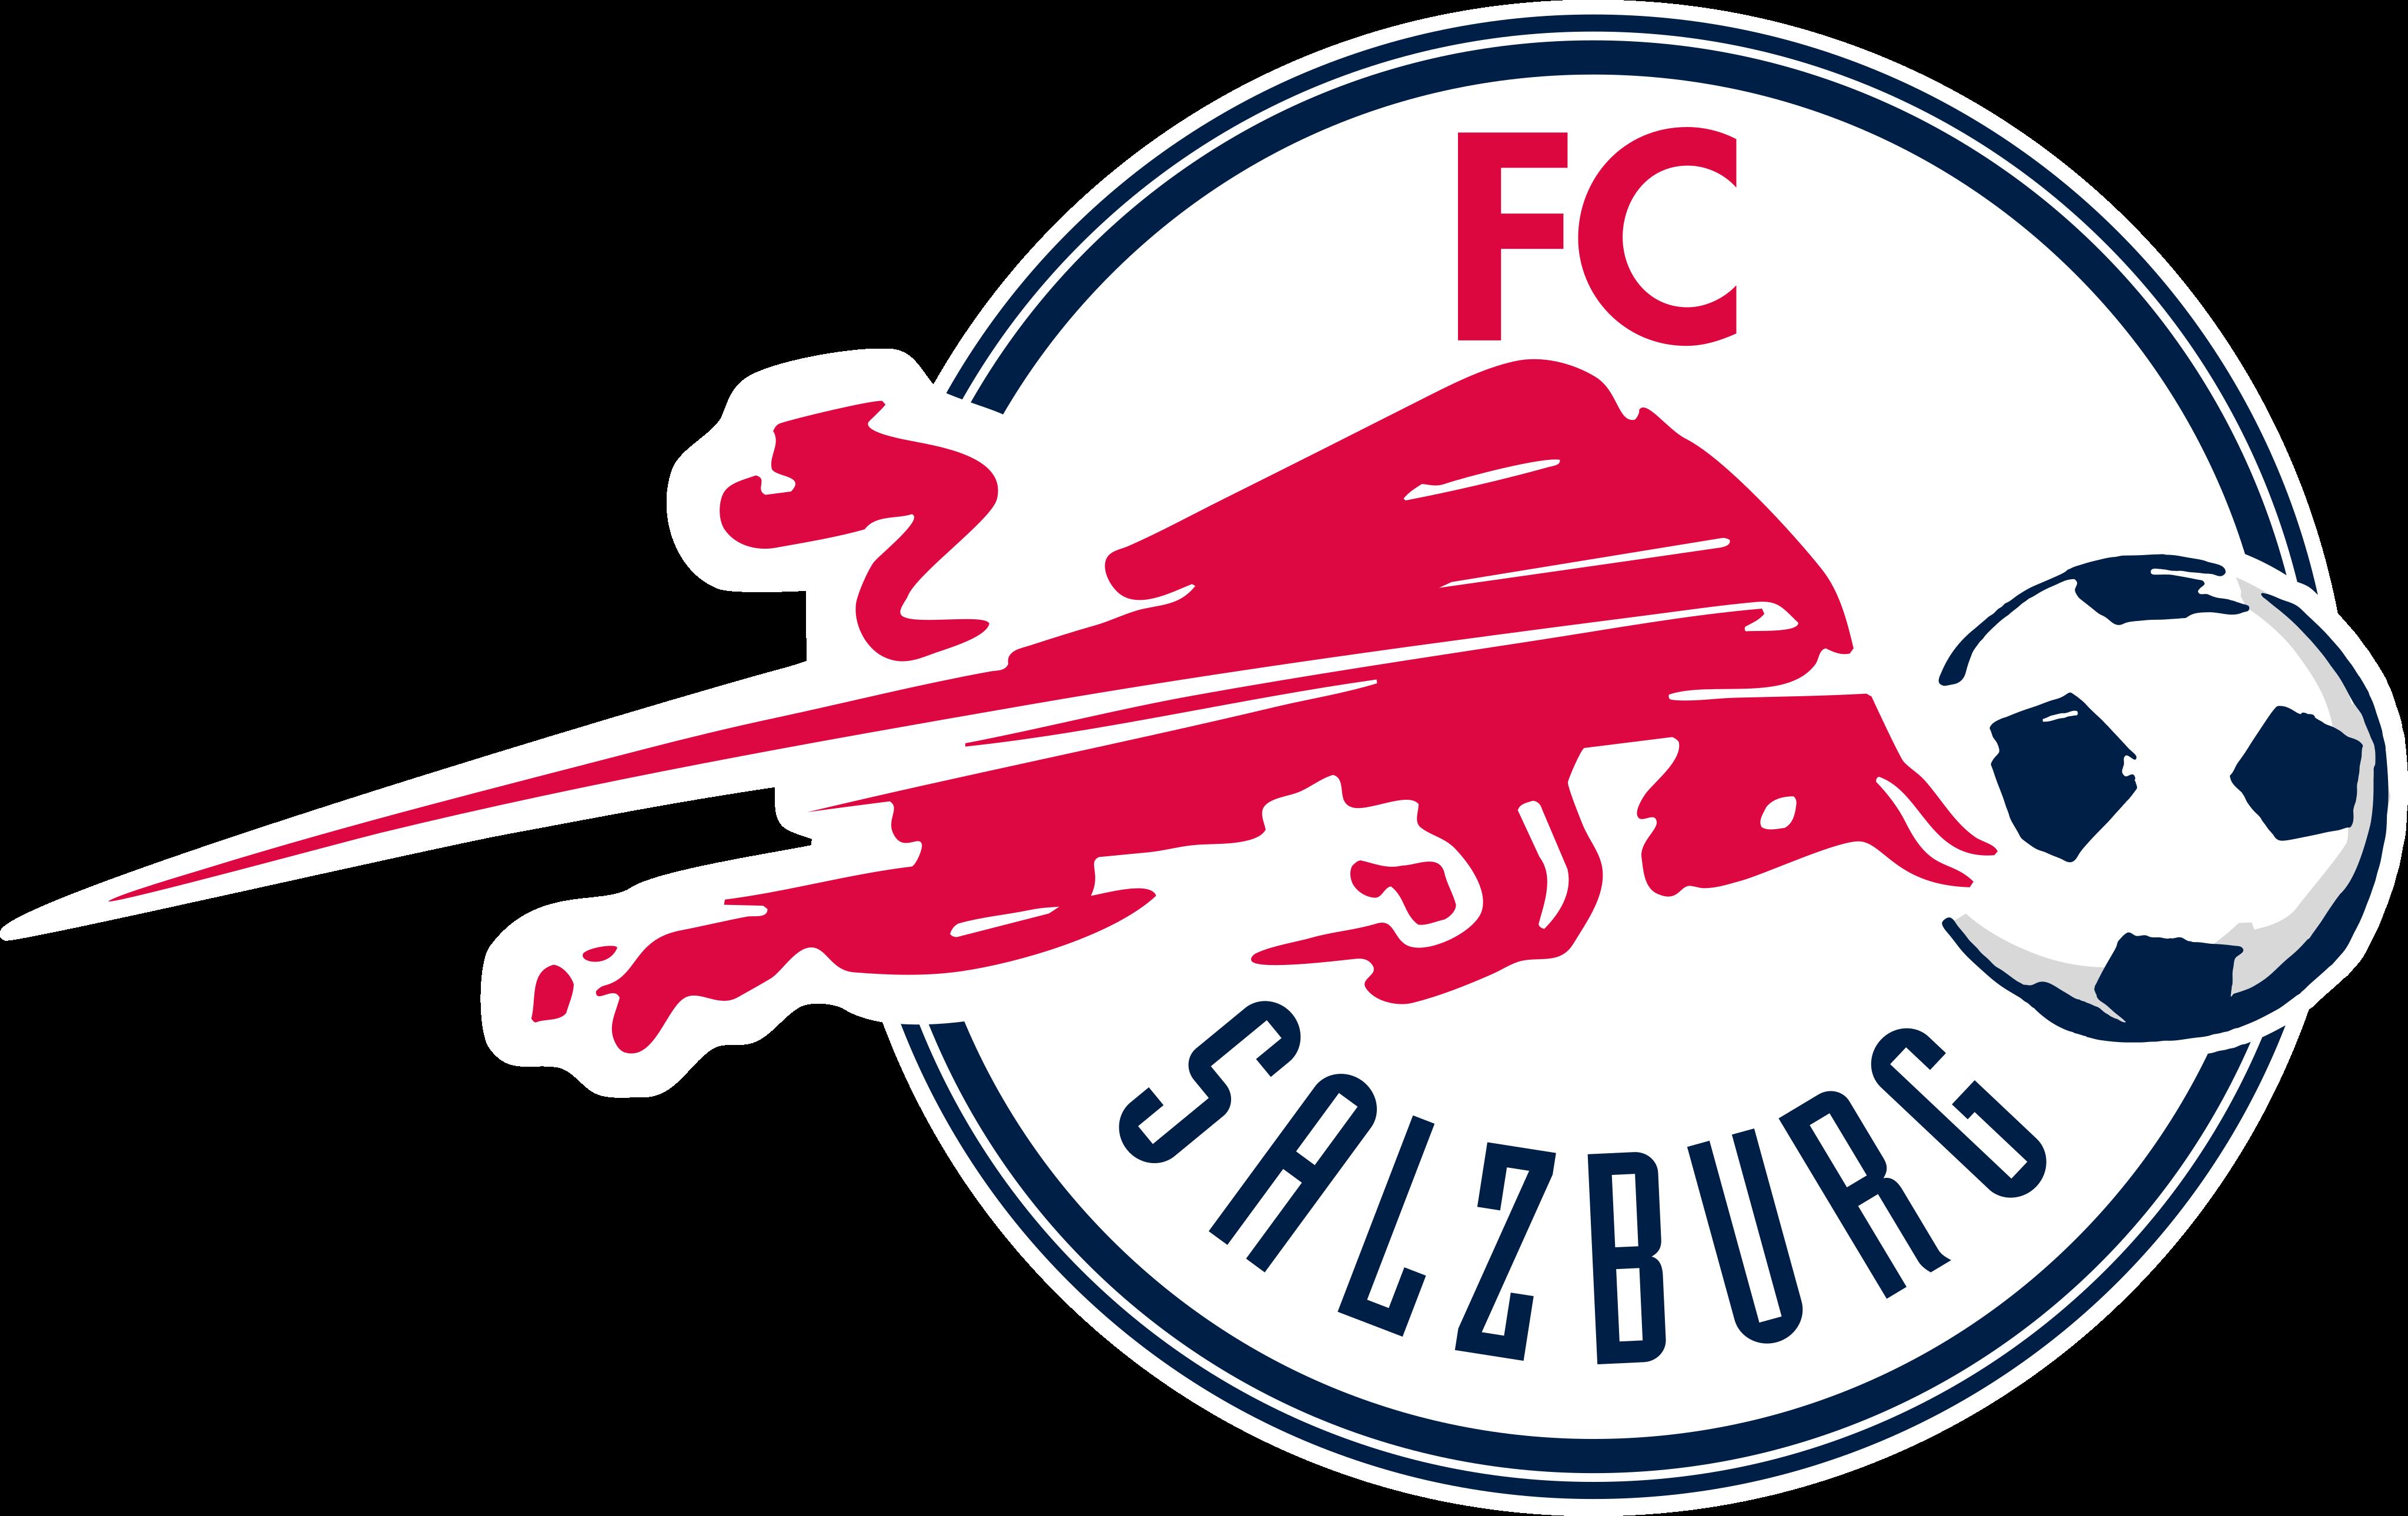 redbull salzburg logo 8 - Red Bull Salzburg Logo – Escudo